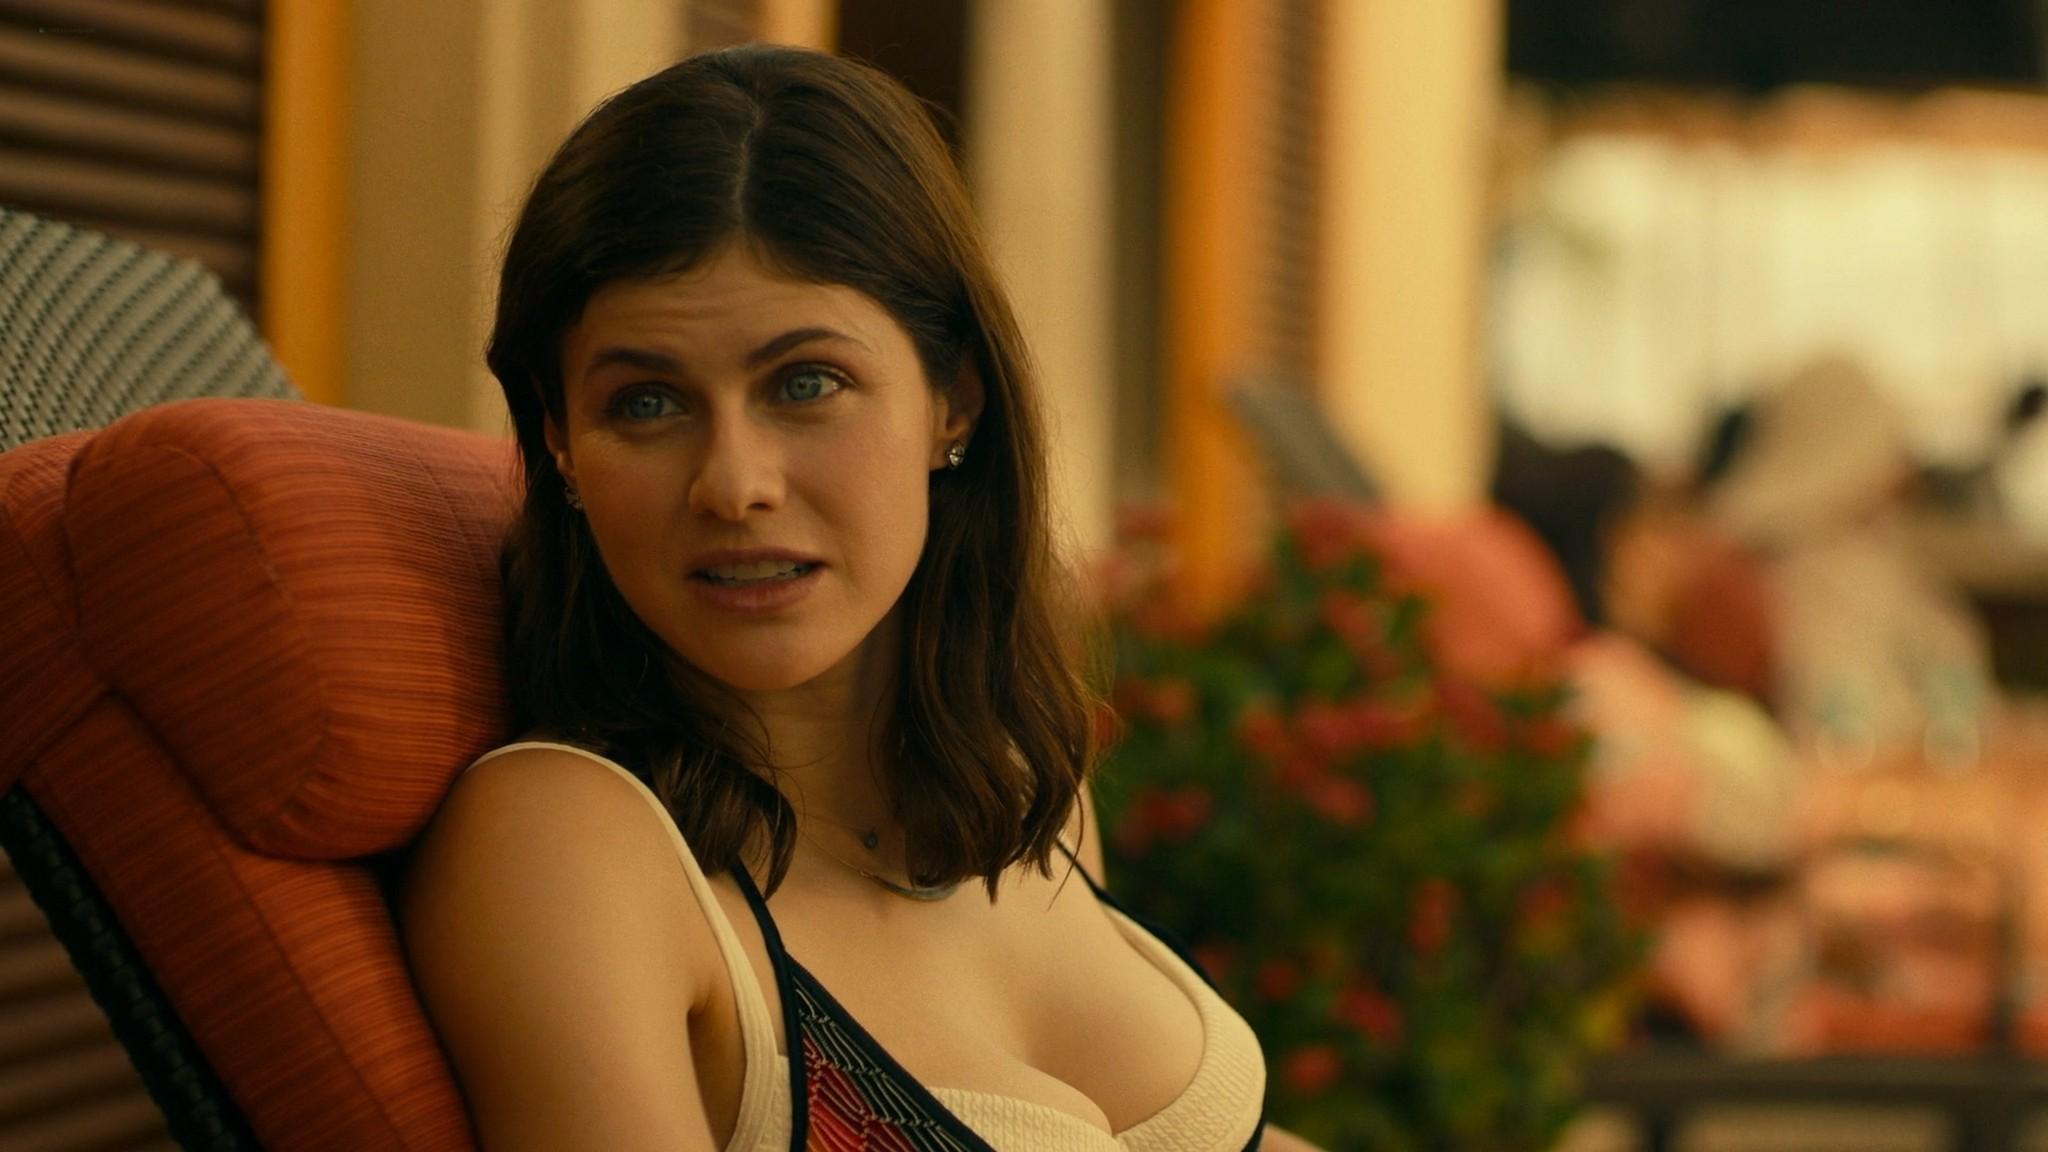 Alexandra Daddario nude side boob Sydney Sweeney Brittany OGrady hot The White Lotus 2011 s1e2 1080p Web 13